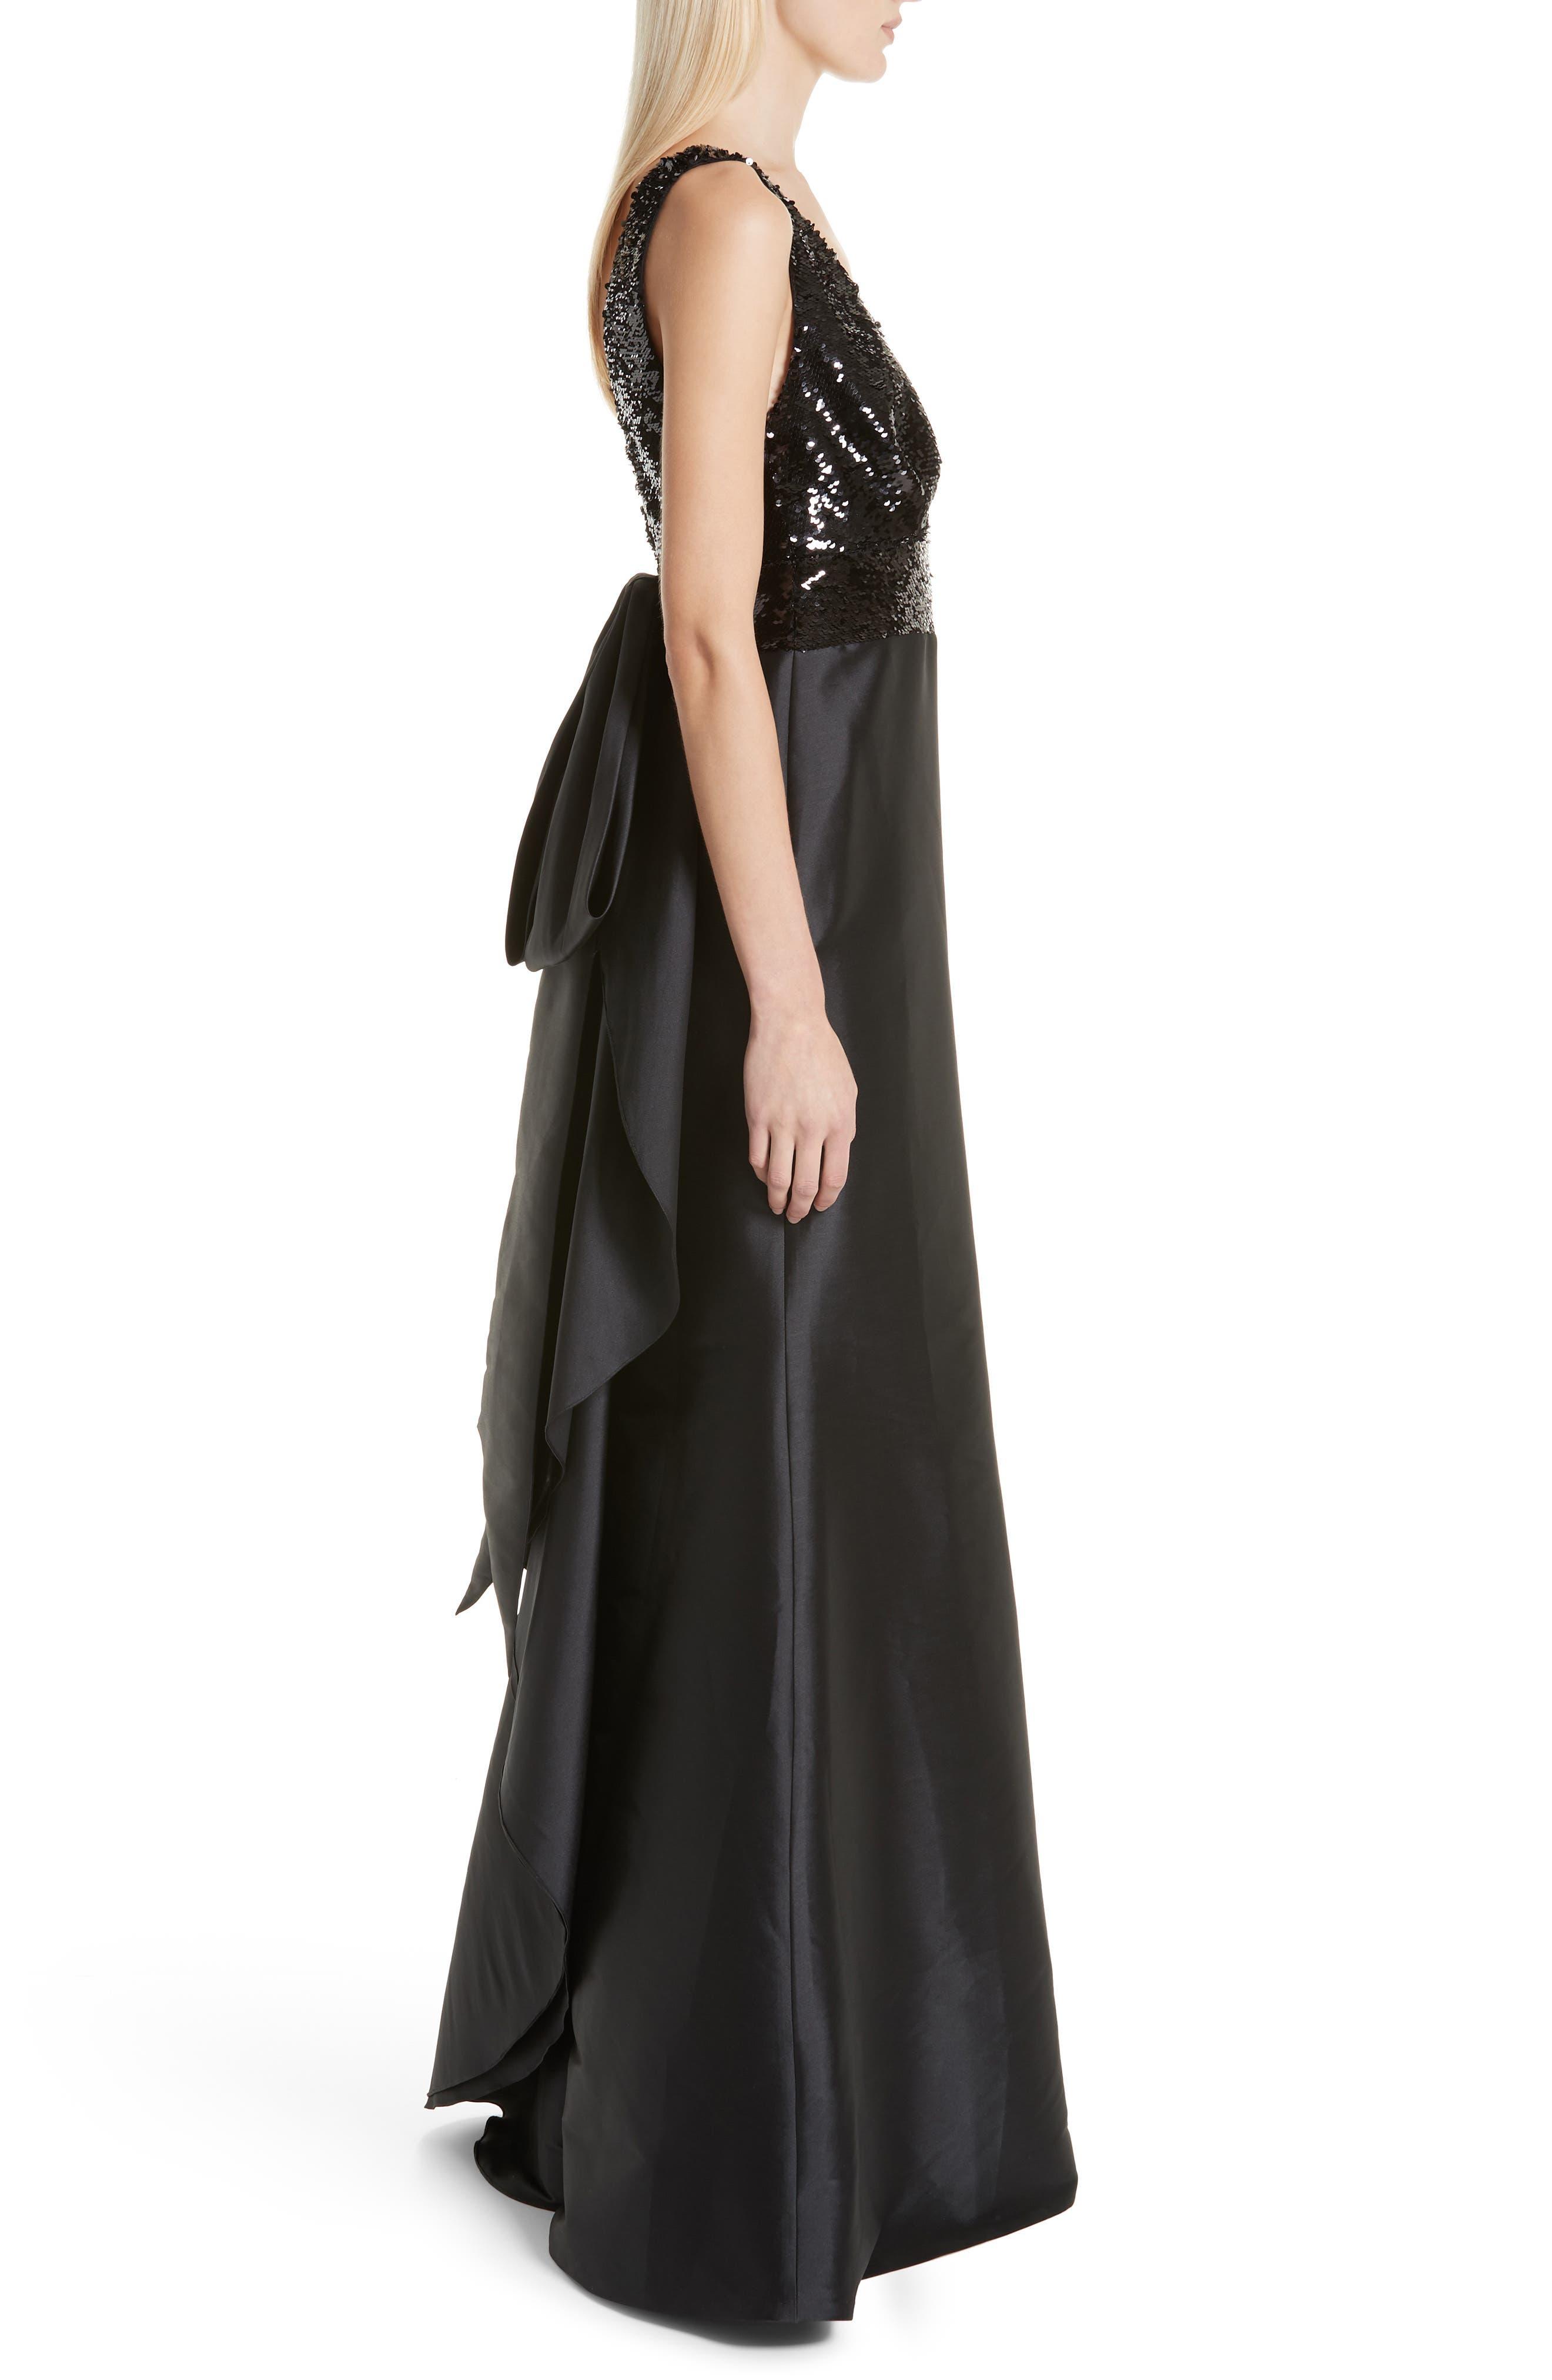 SACHIN & BABI, Topanga Sequin Bodice Bow Back Gown, Alternate thumbnail 4, color, JET